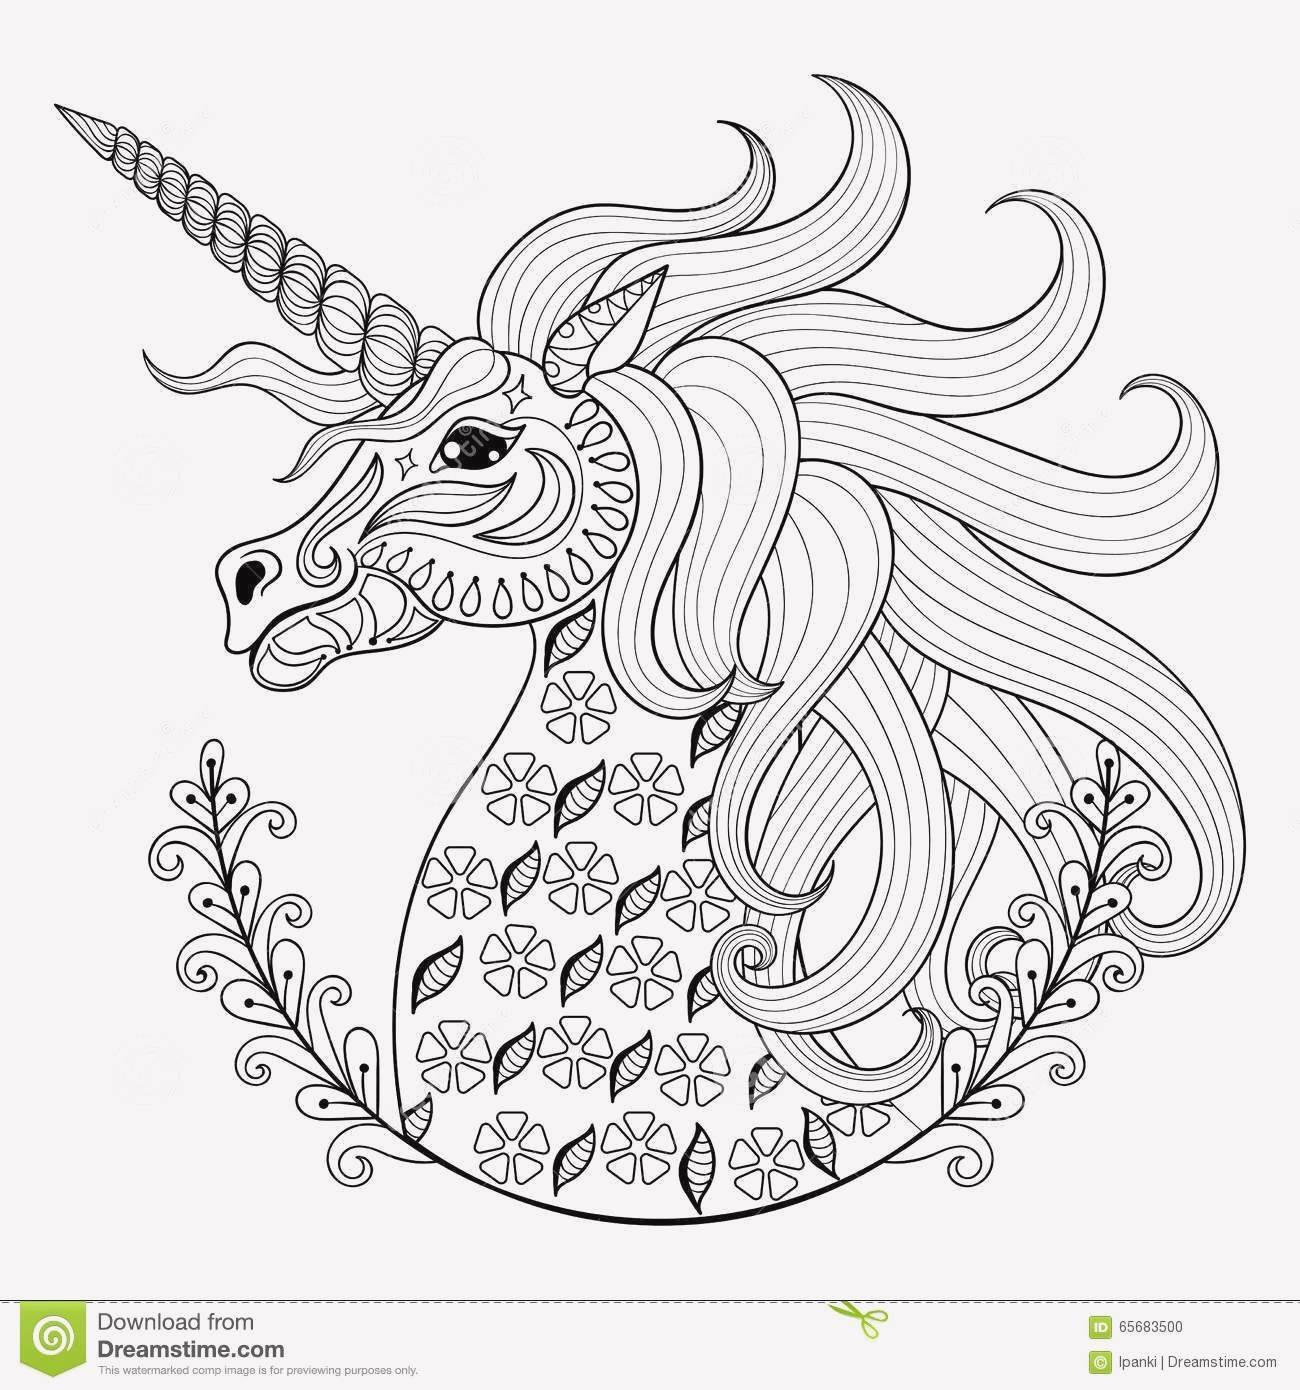 Pegasus Zum Ausmalen Neu 25 Fantastisch Malvorlage Pegasus